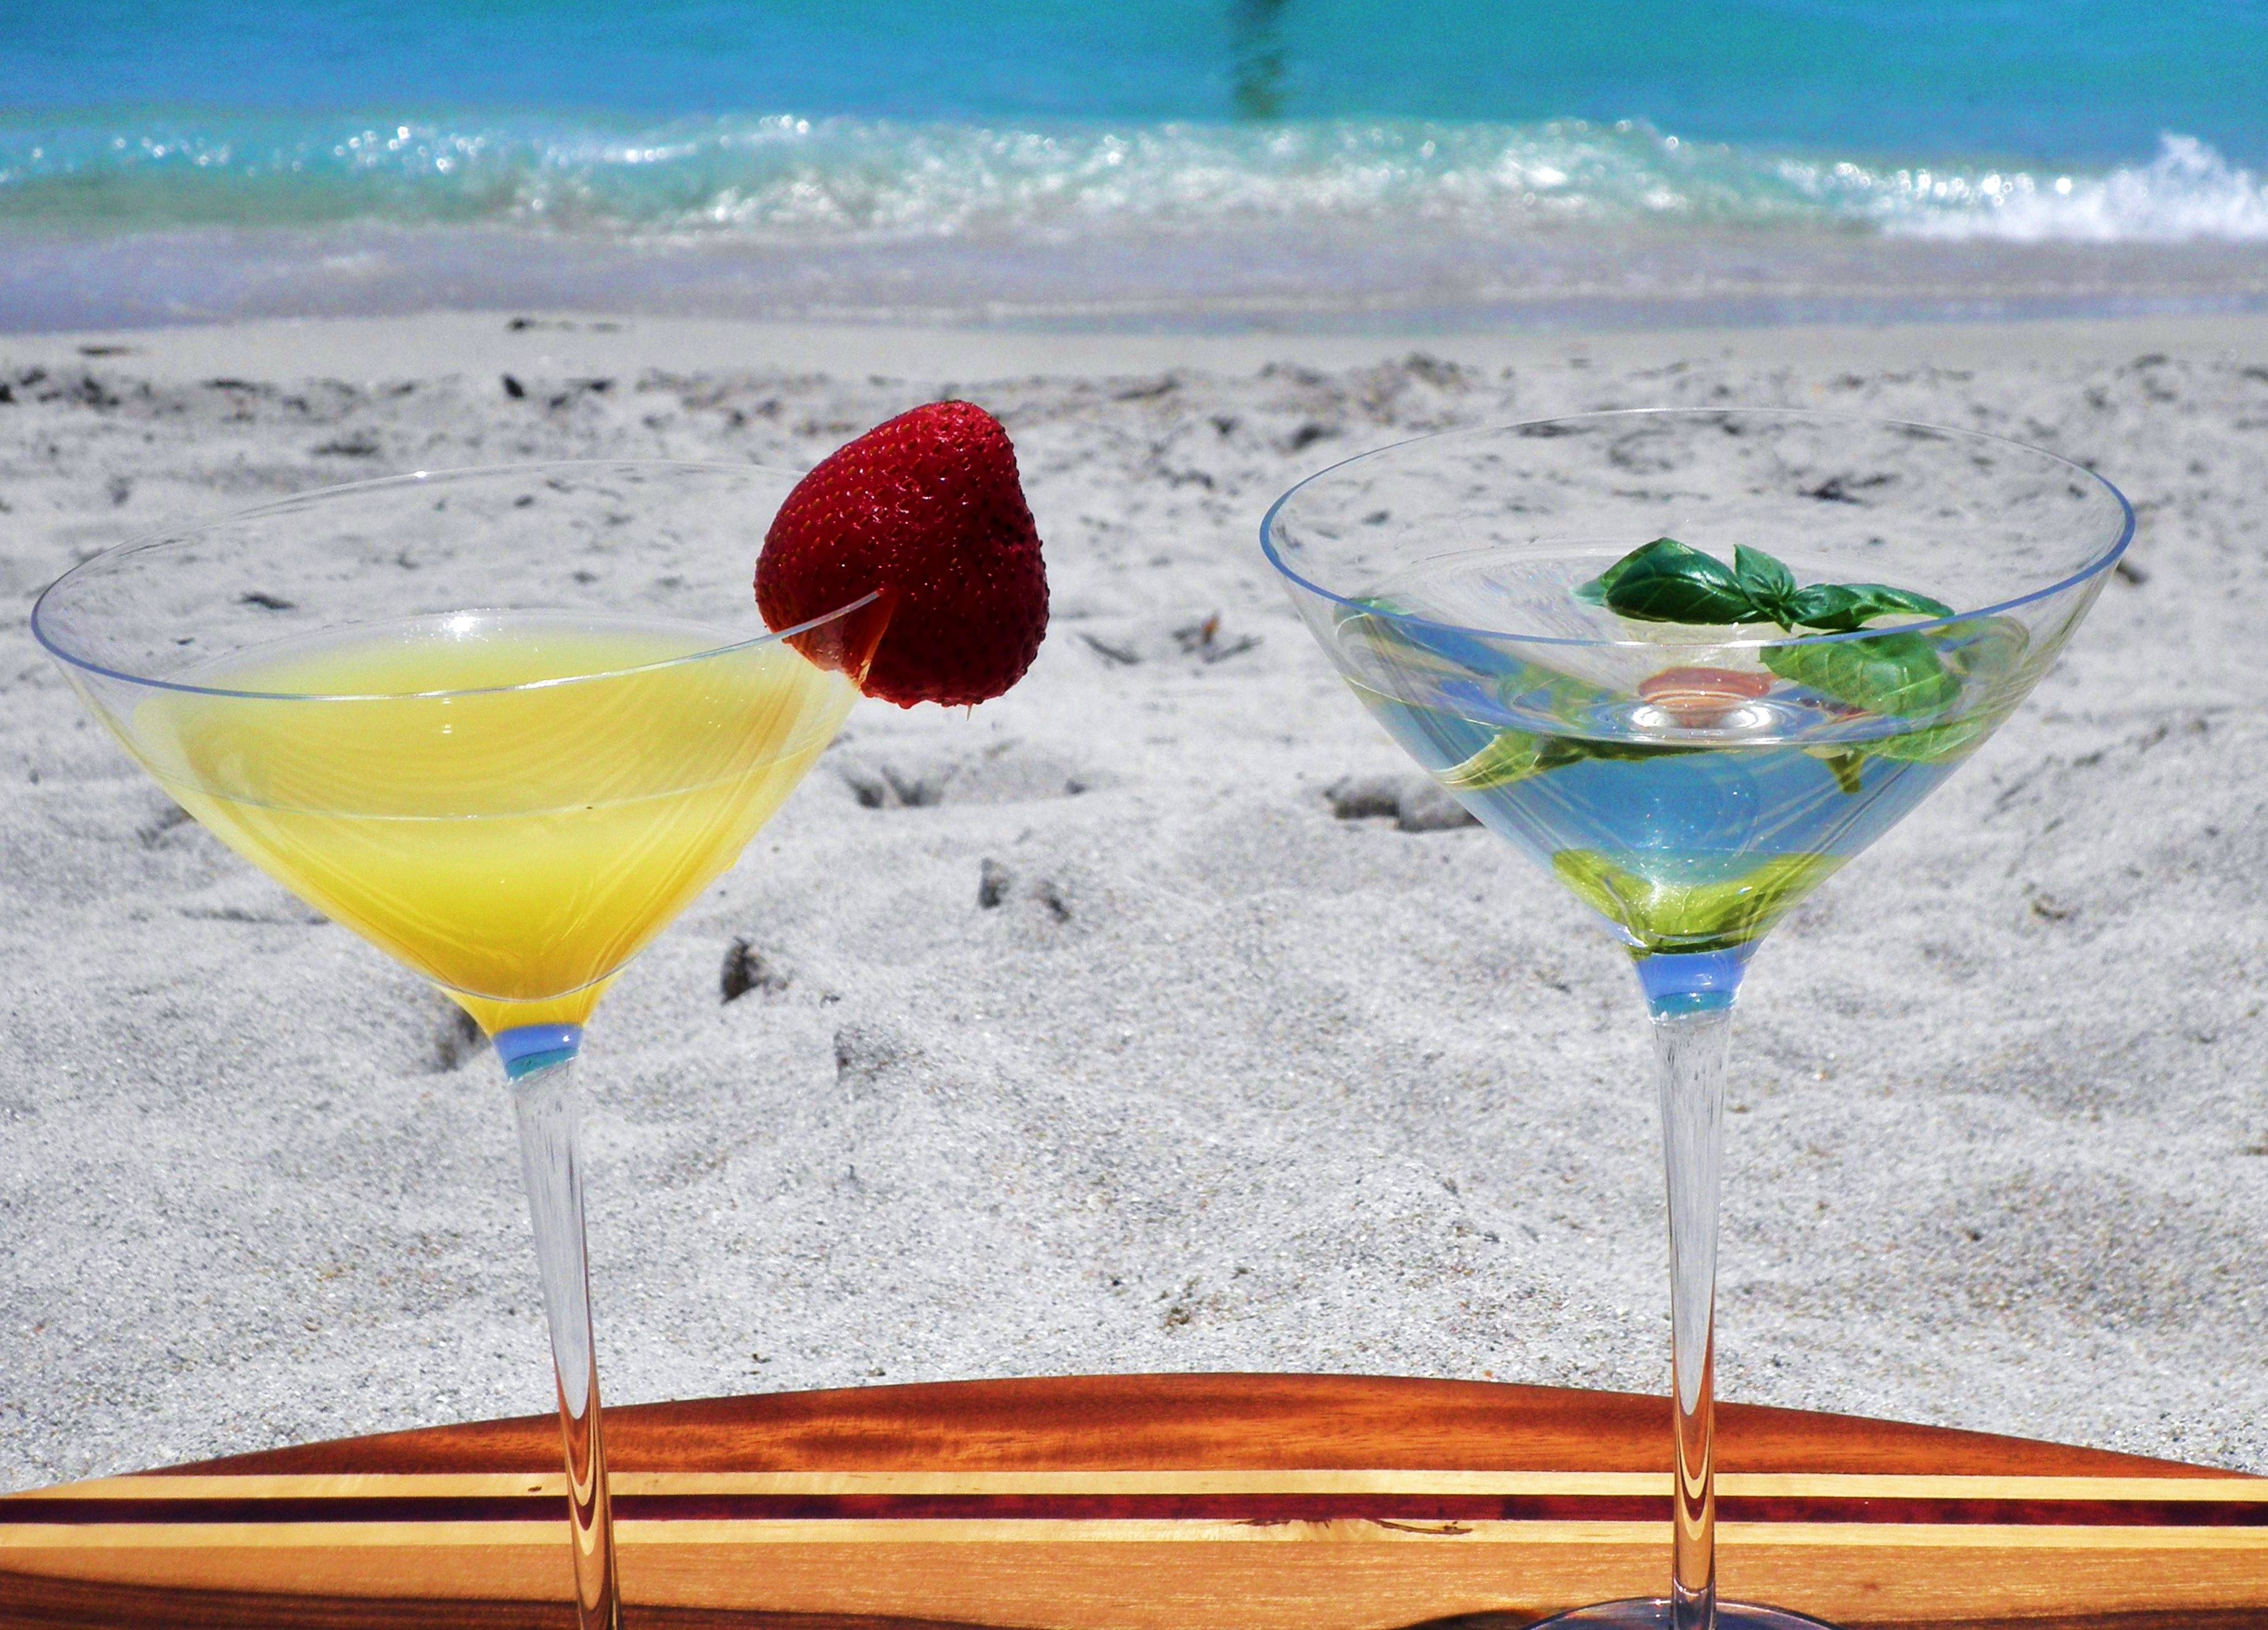 Cocktail Time Beach Cocktailscocktail Drinkslavender Martinidigital